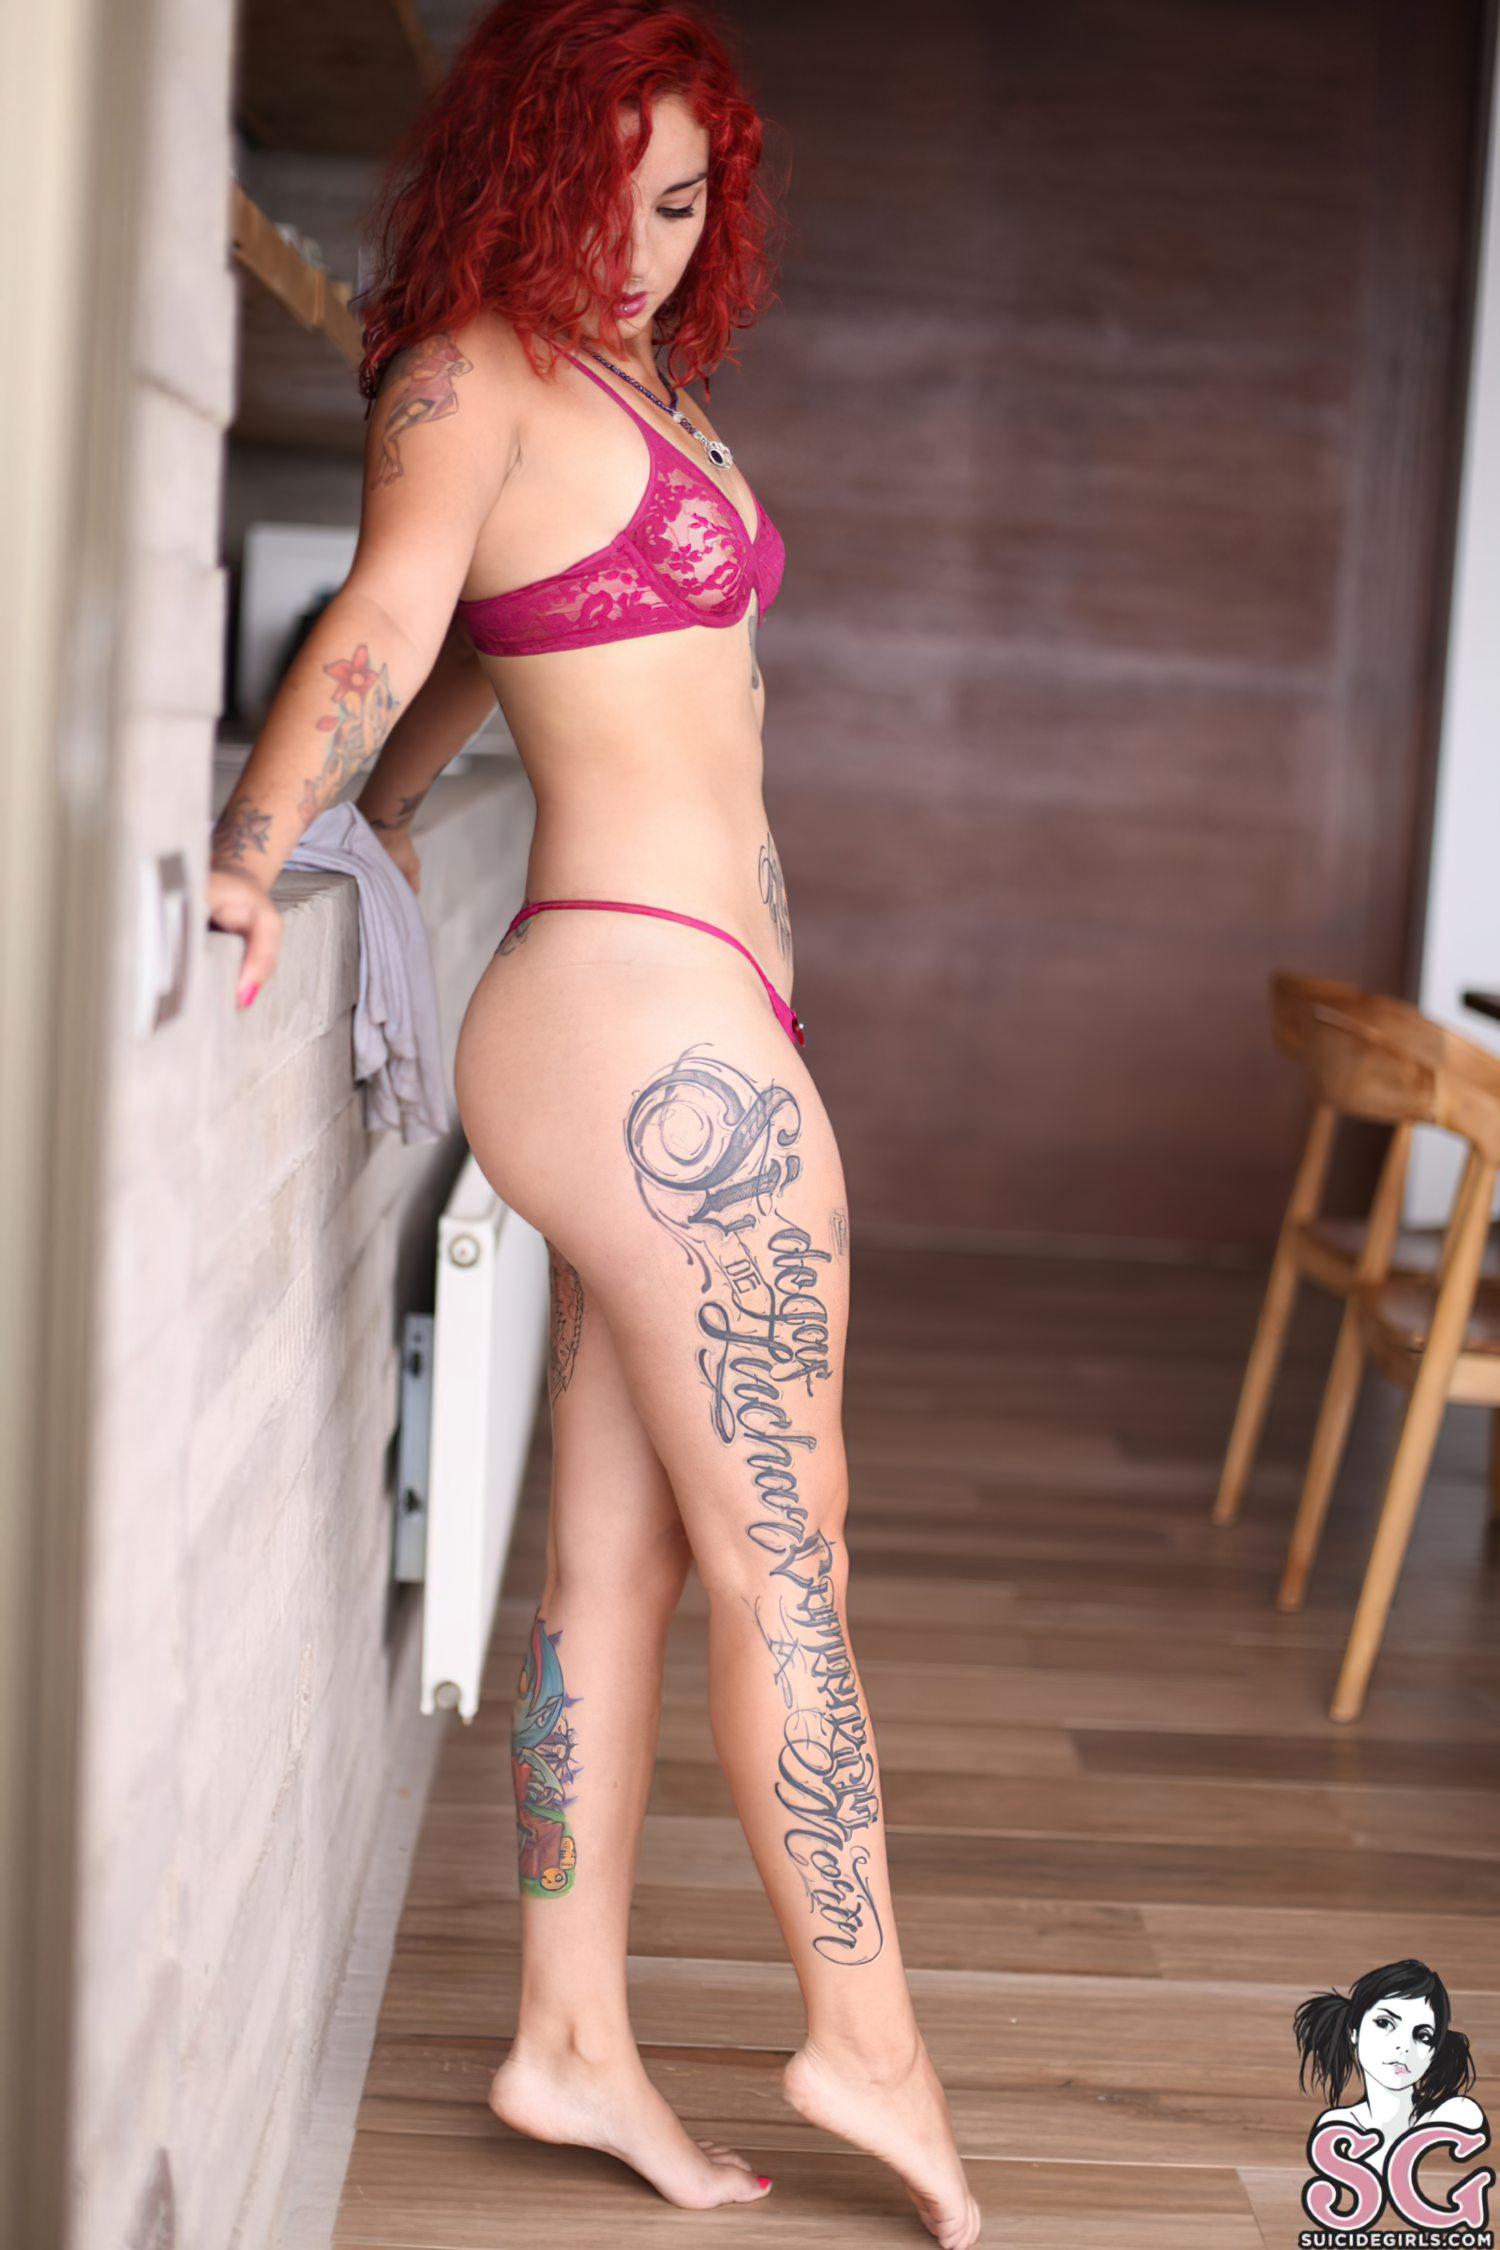 Chelss Mulher Nua (25)